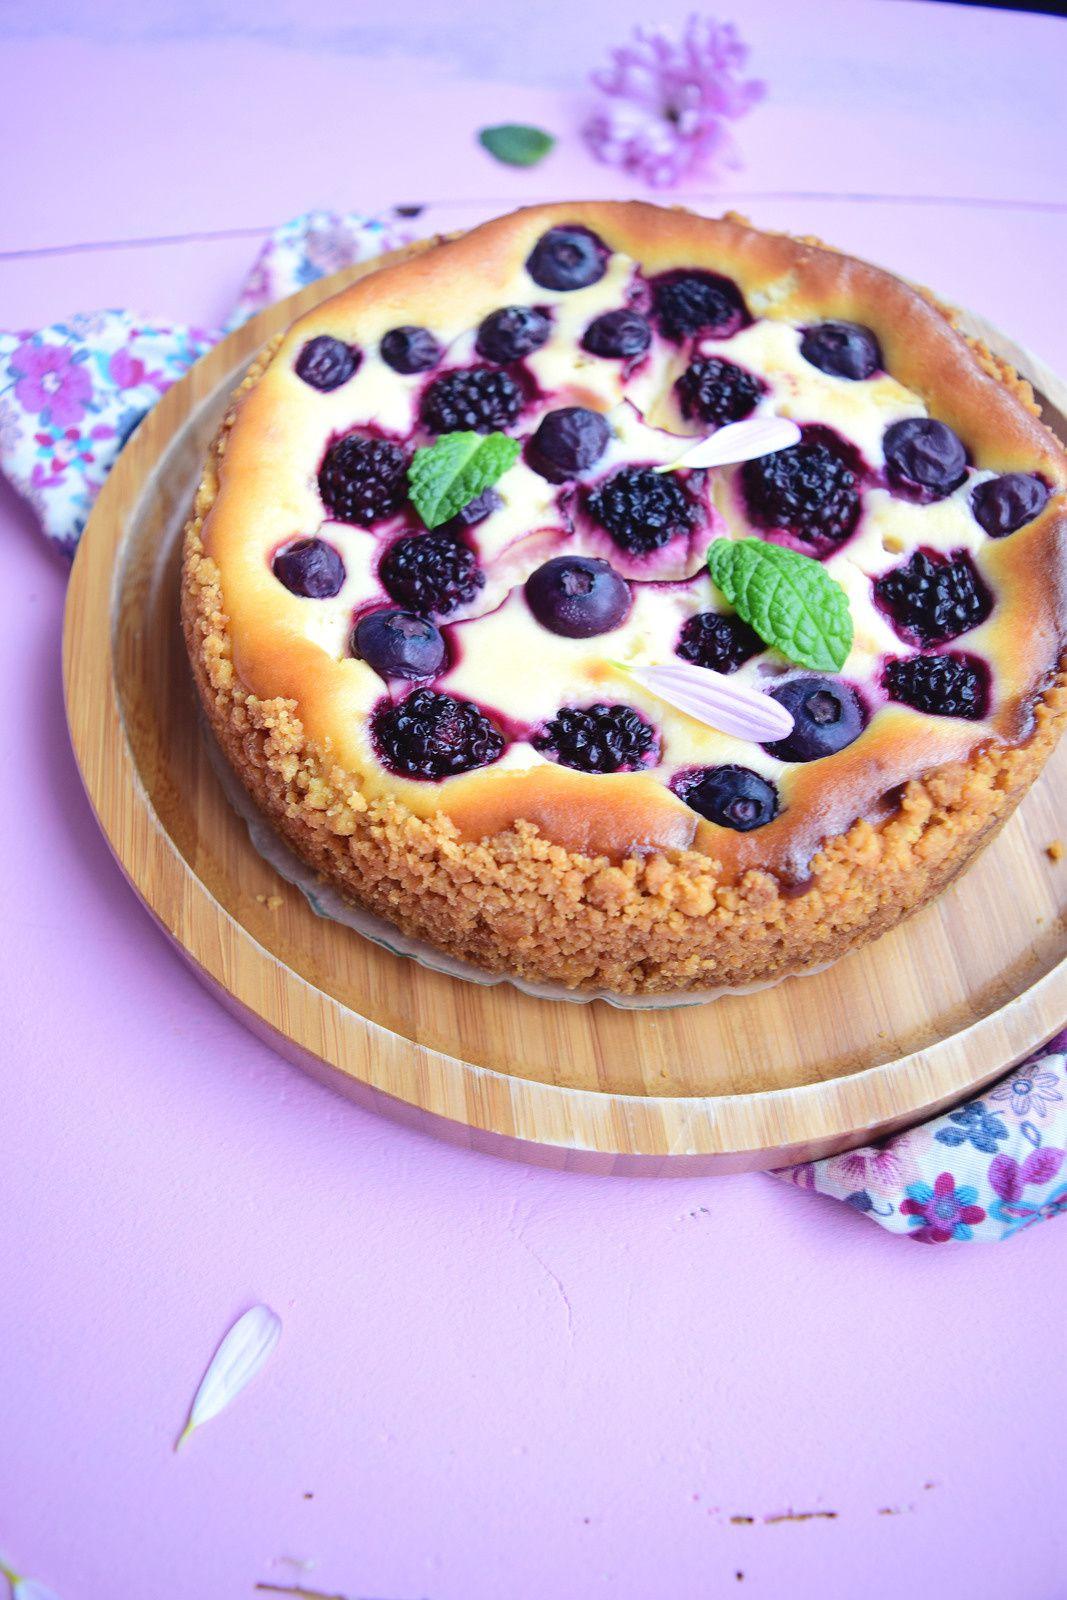 Cheesecake chocolat blanc et fruits noirs